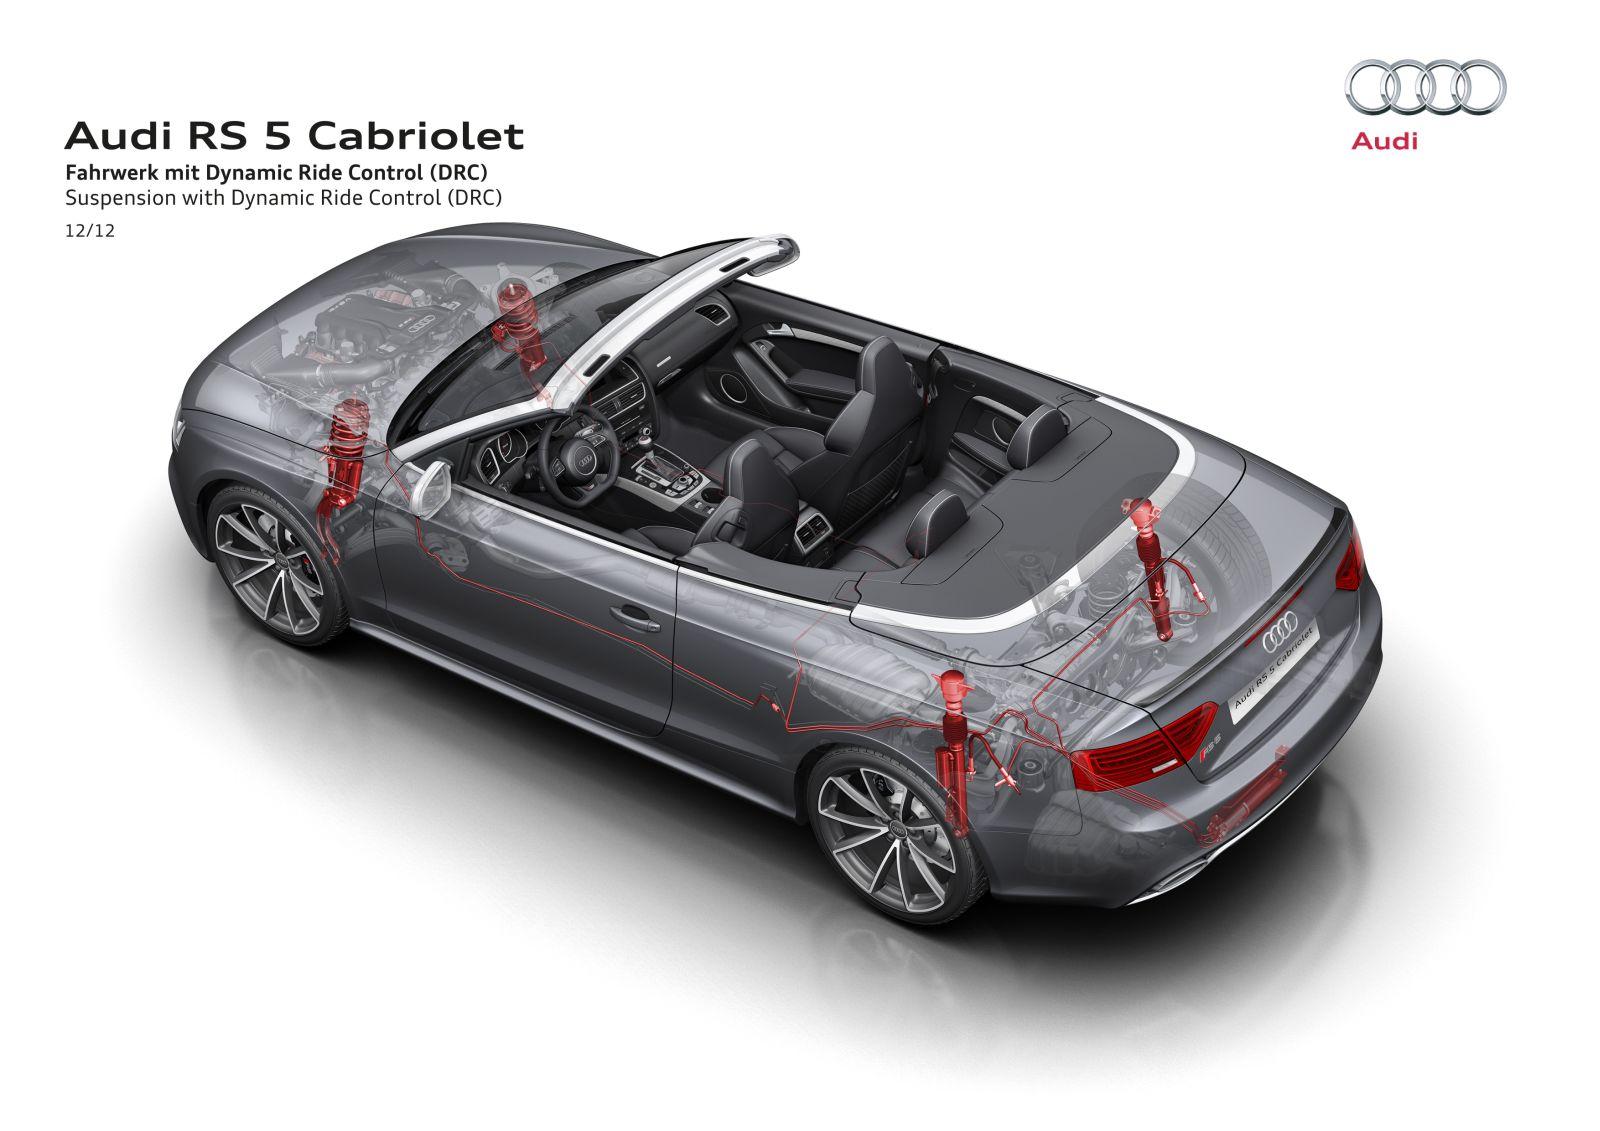 a4e gallery audi a5 facelift audi rs5 cabrio technische details. Black Bedroom Furniture Sets. Home Design Ideas